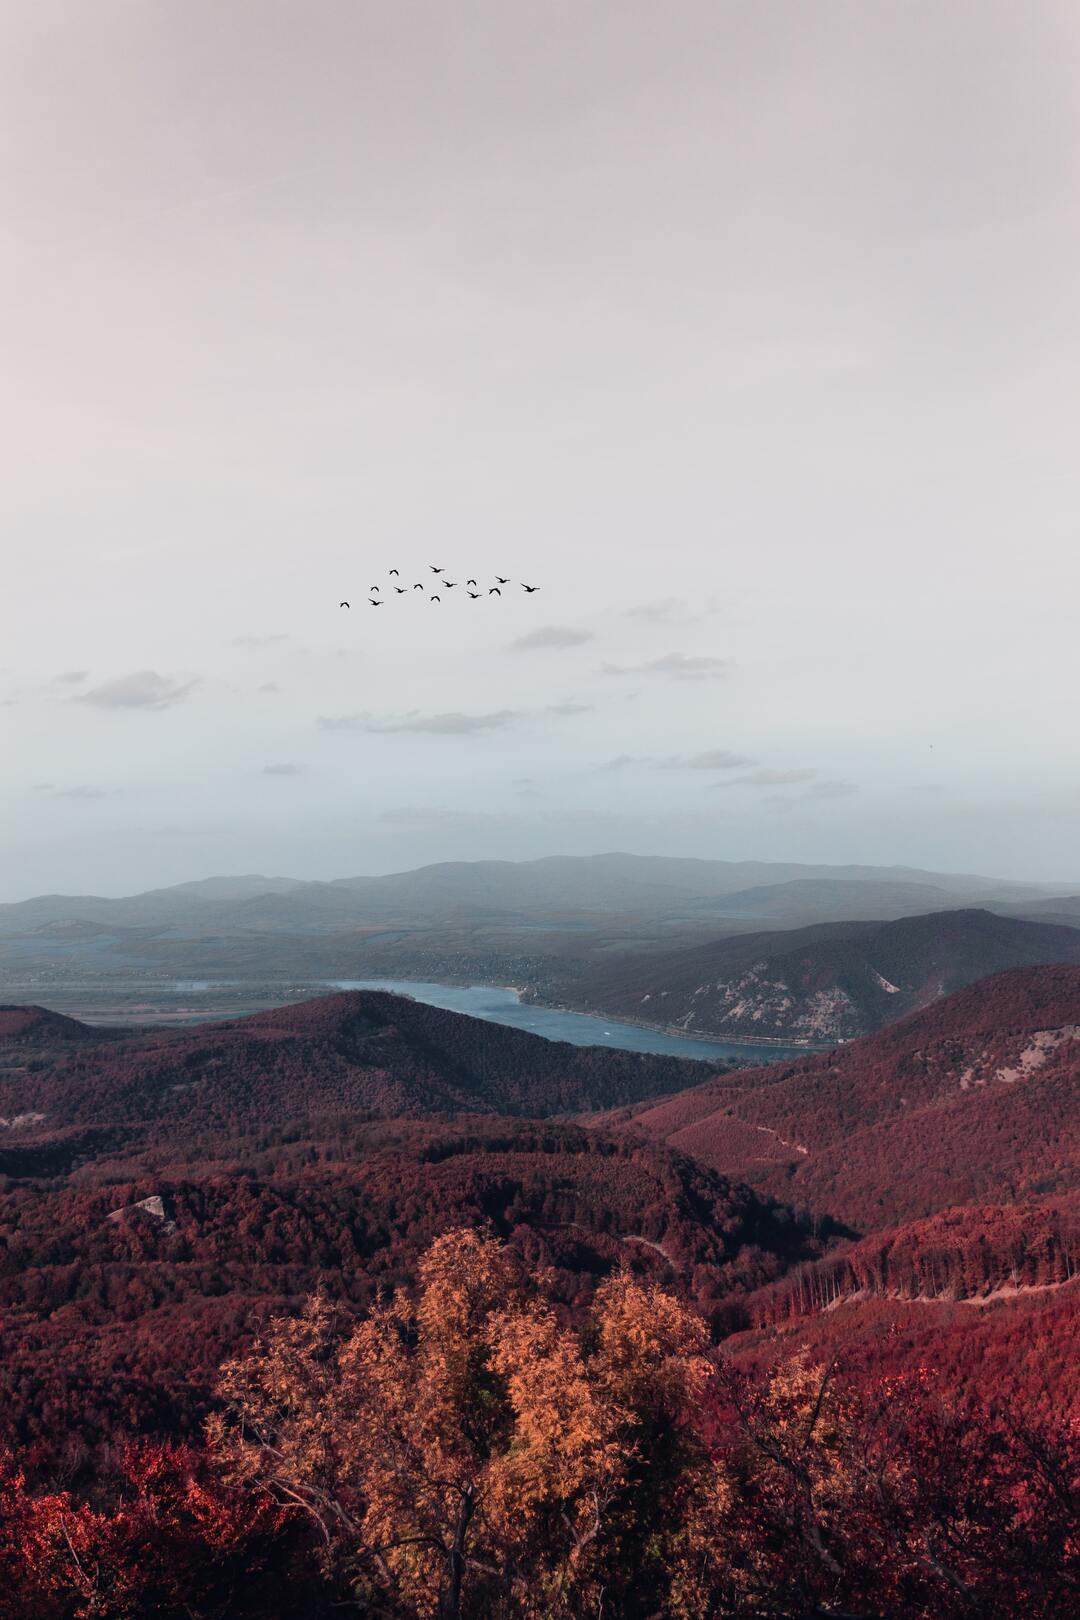 Der Wald  Zsivány-sziklák in Ungarn